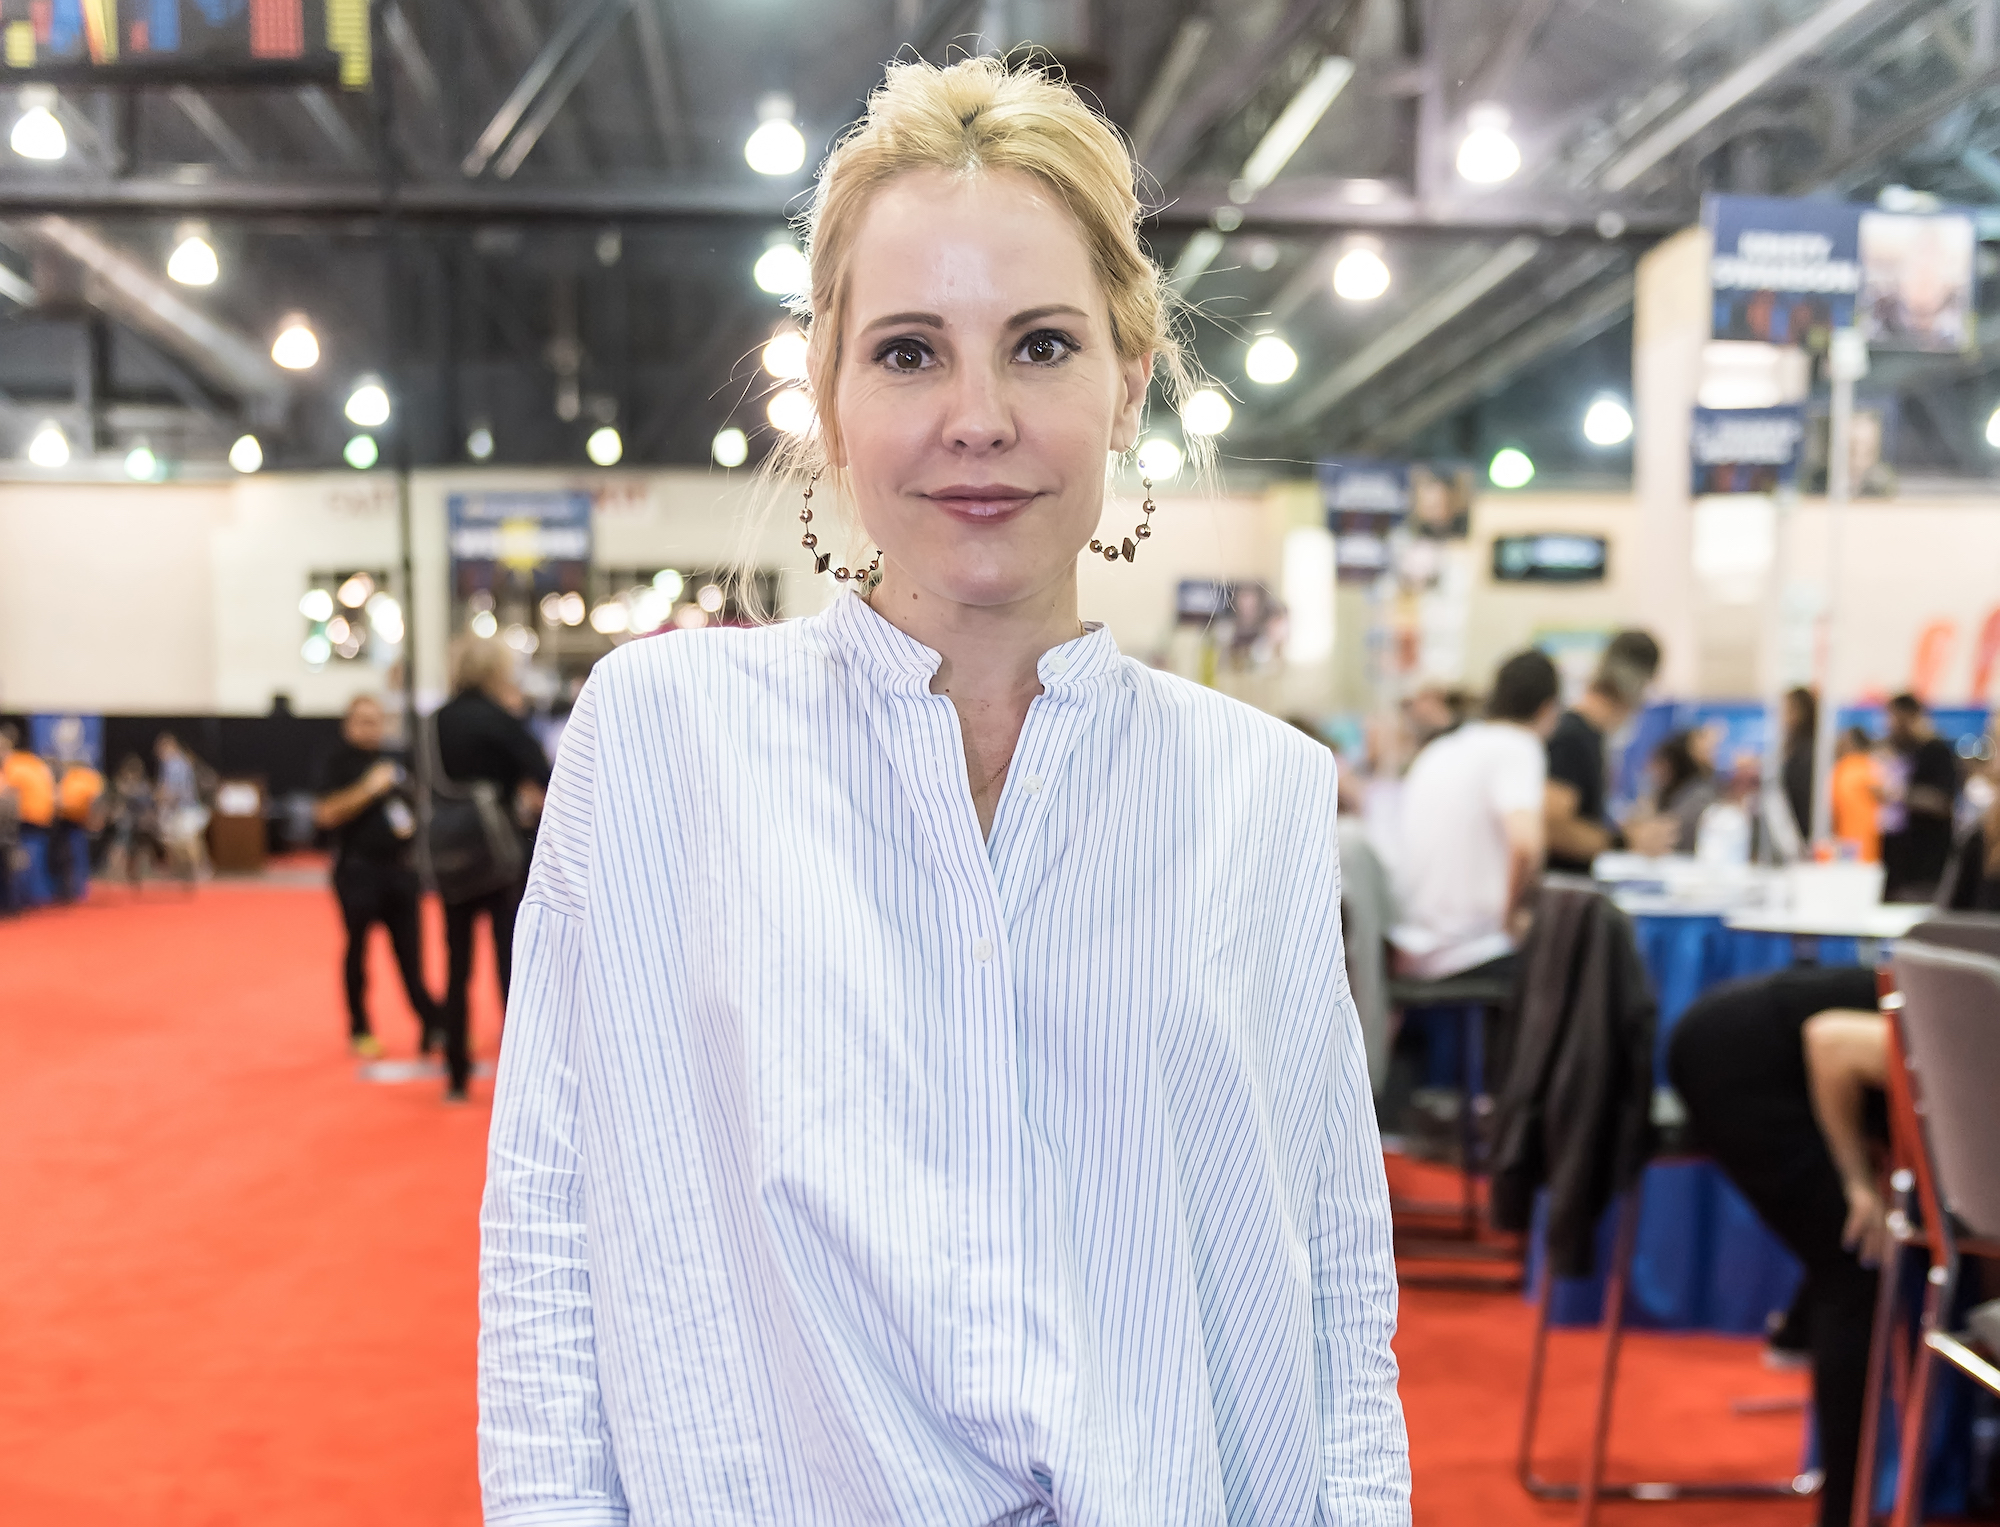 Emma Caulfield at Wizard World Comic Con Philadelphia 2017 on June 4, 2017